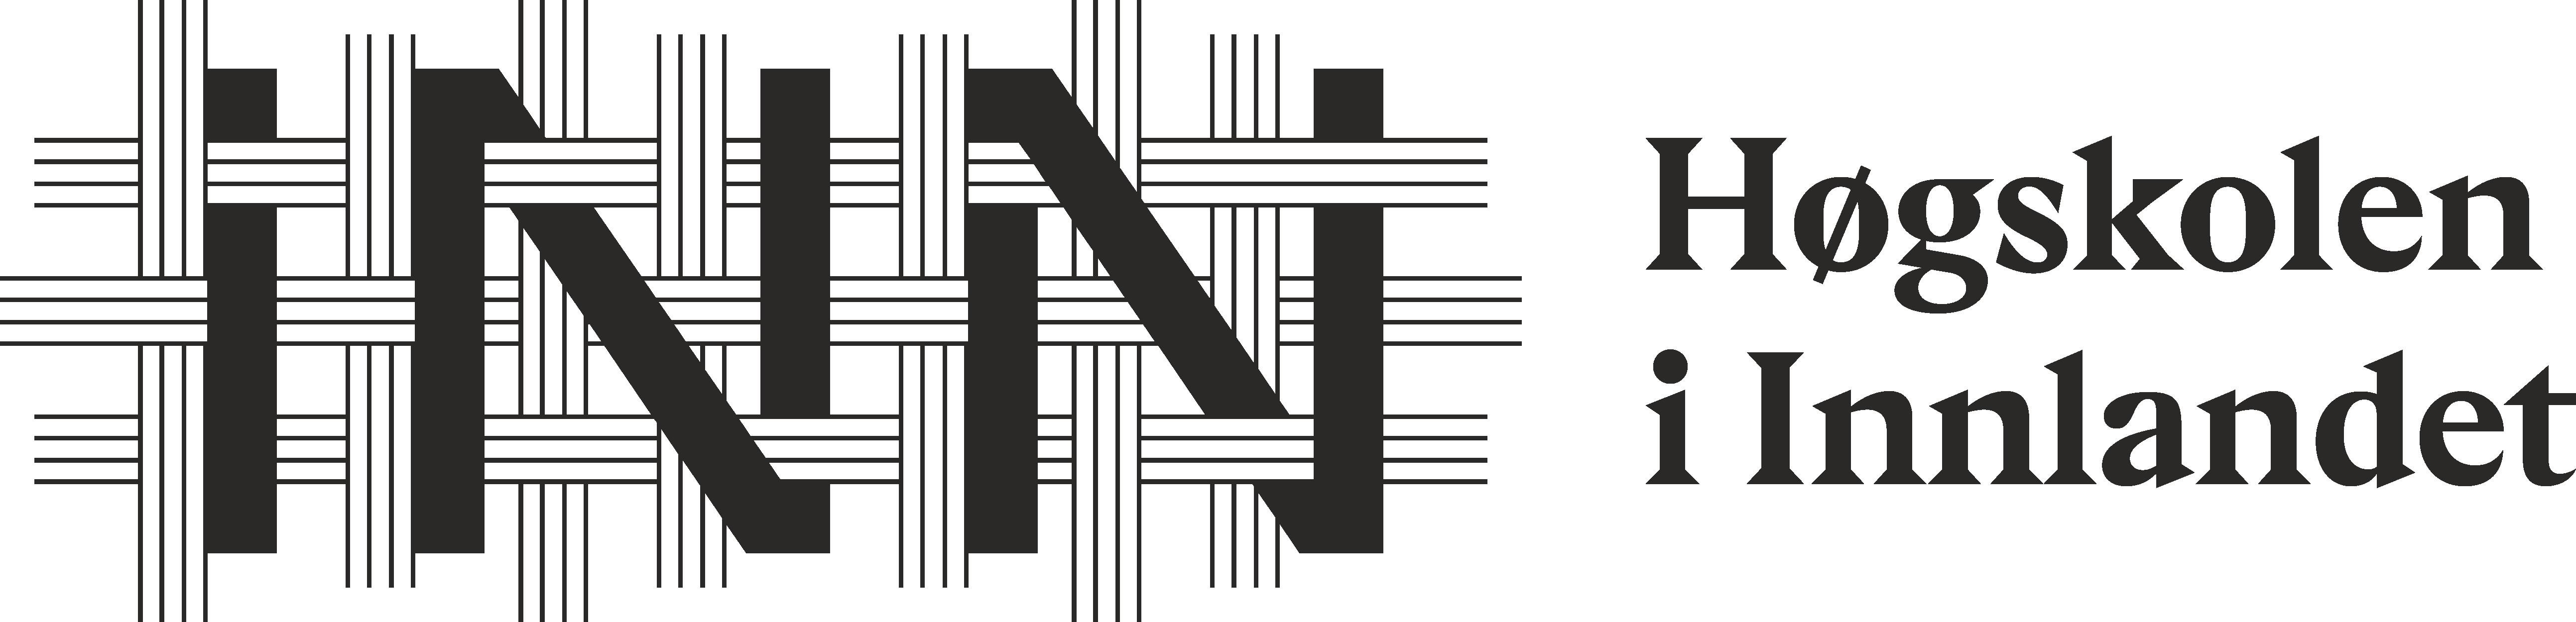 Logo Høgskolen i Innlandet